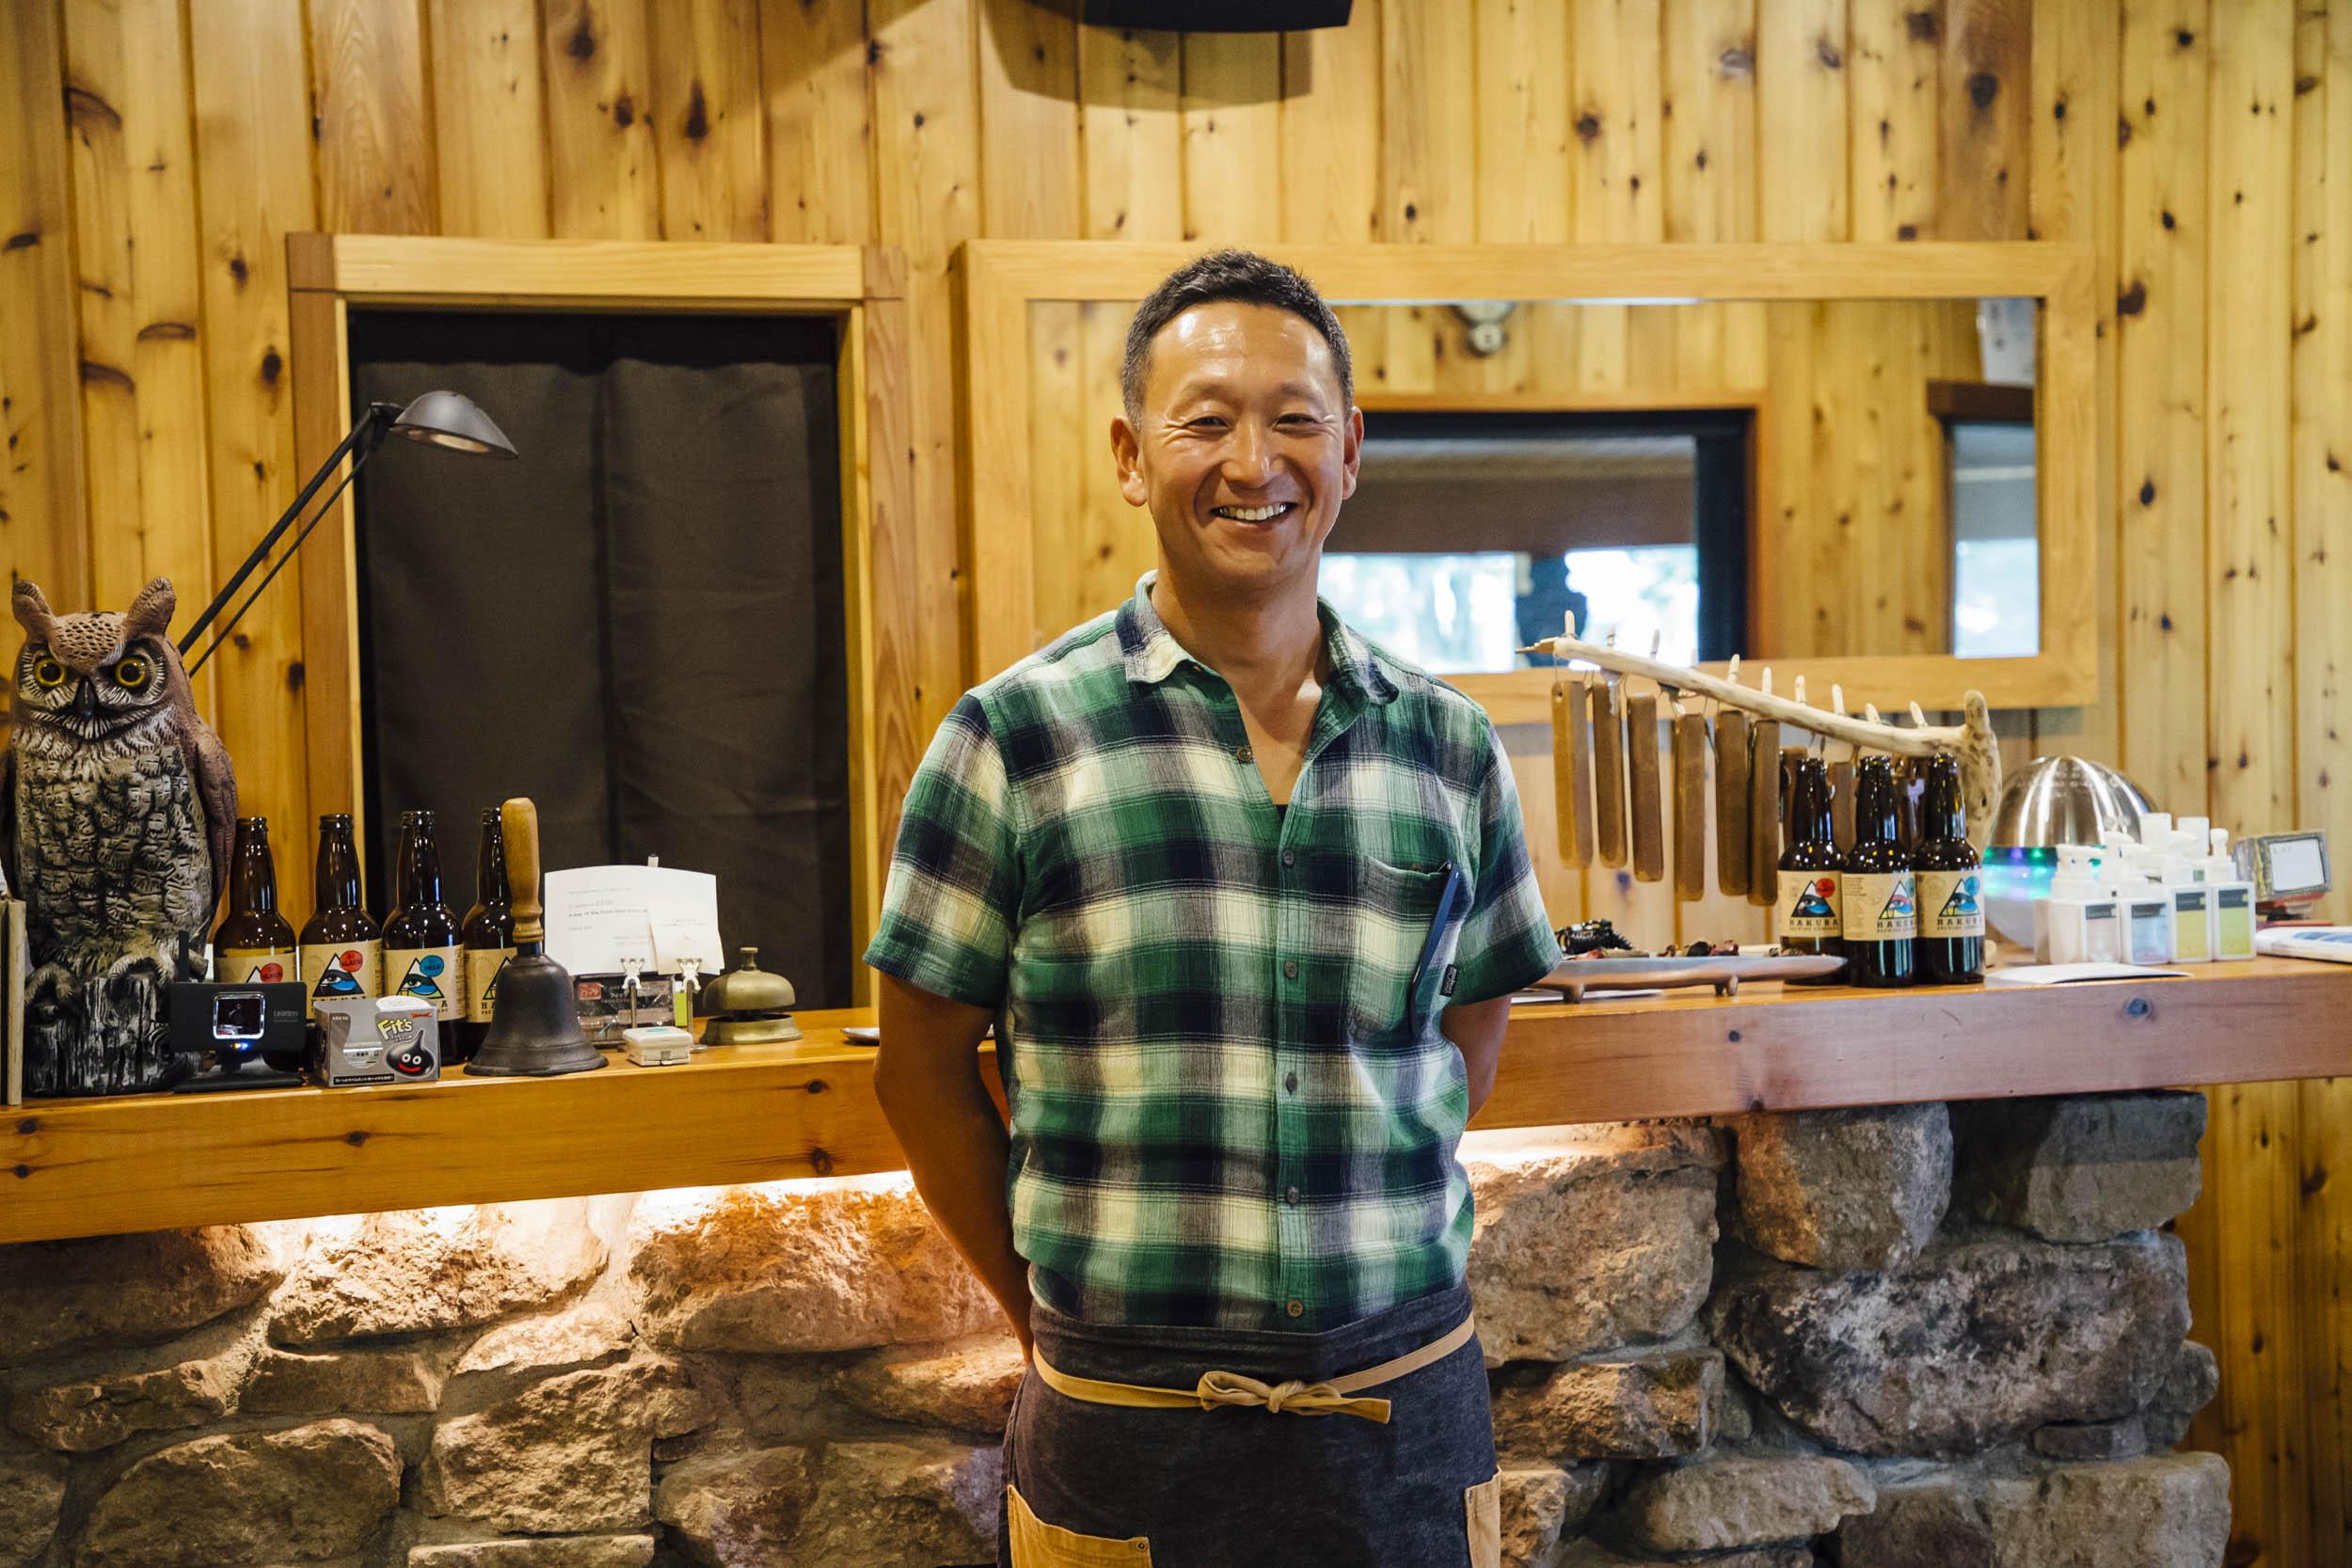 MG_5094 長野県白馬村、Grand Cherokeeオーナーへインタビュー。避暑地としてもアクティブに過ごすにも良し!カフェ観光スポットもご紹介